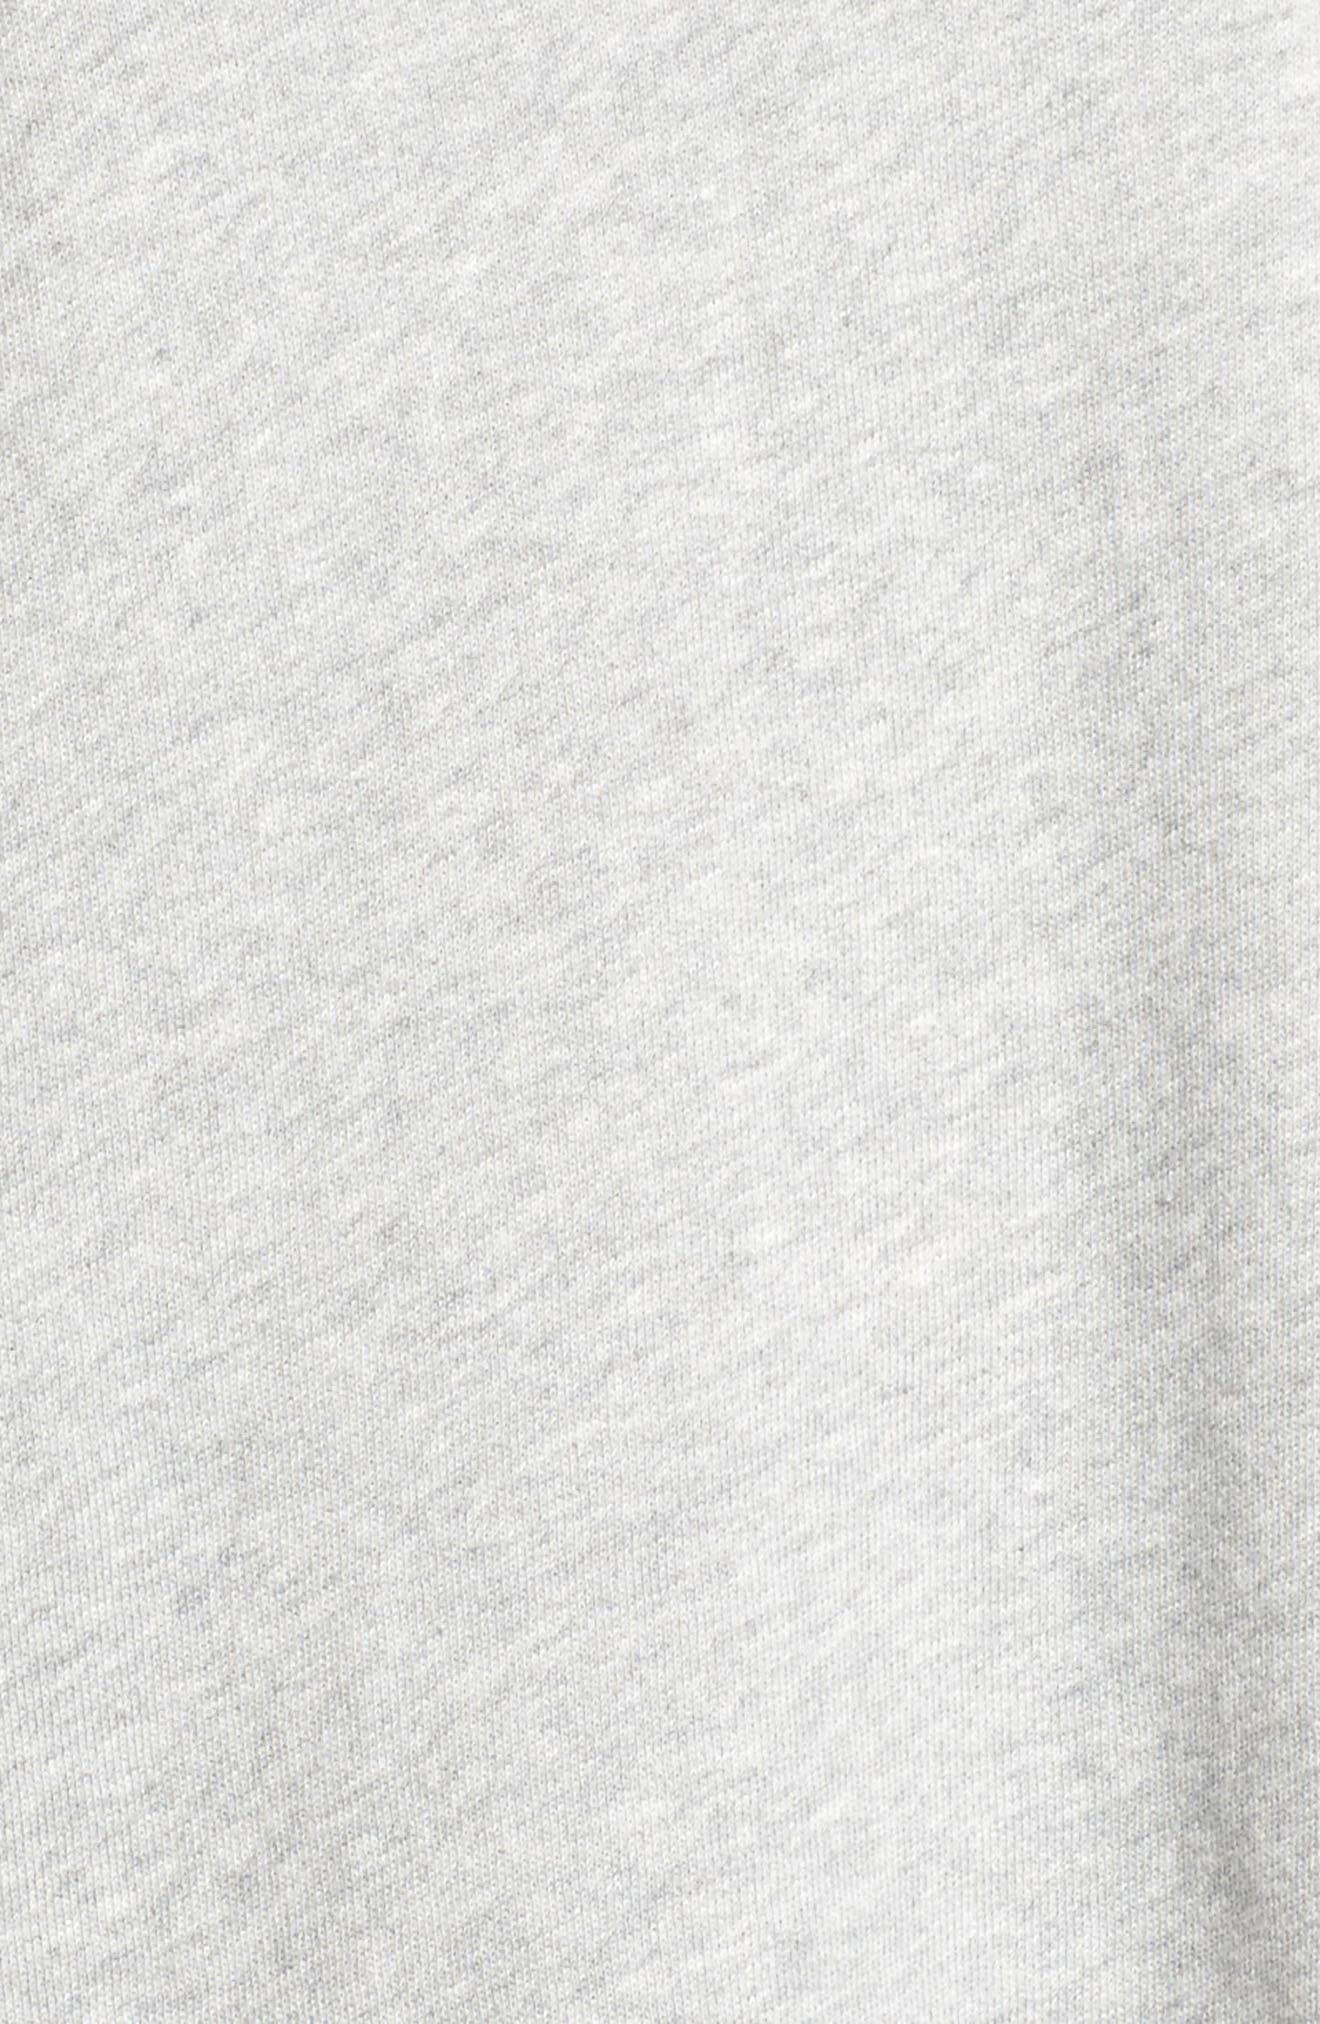 Layered Look Sweatshirt,                             Alternate thumbnail 5, color,                             021